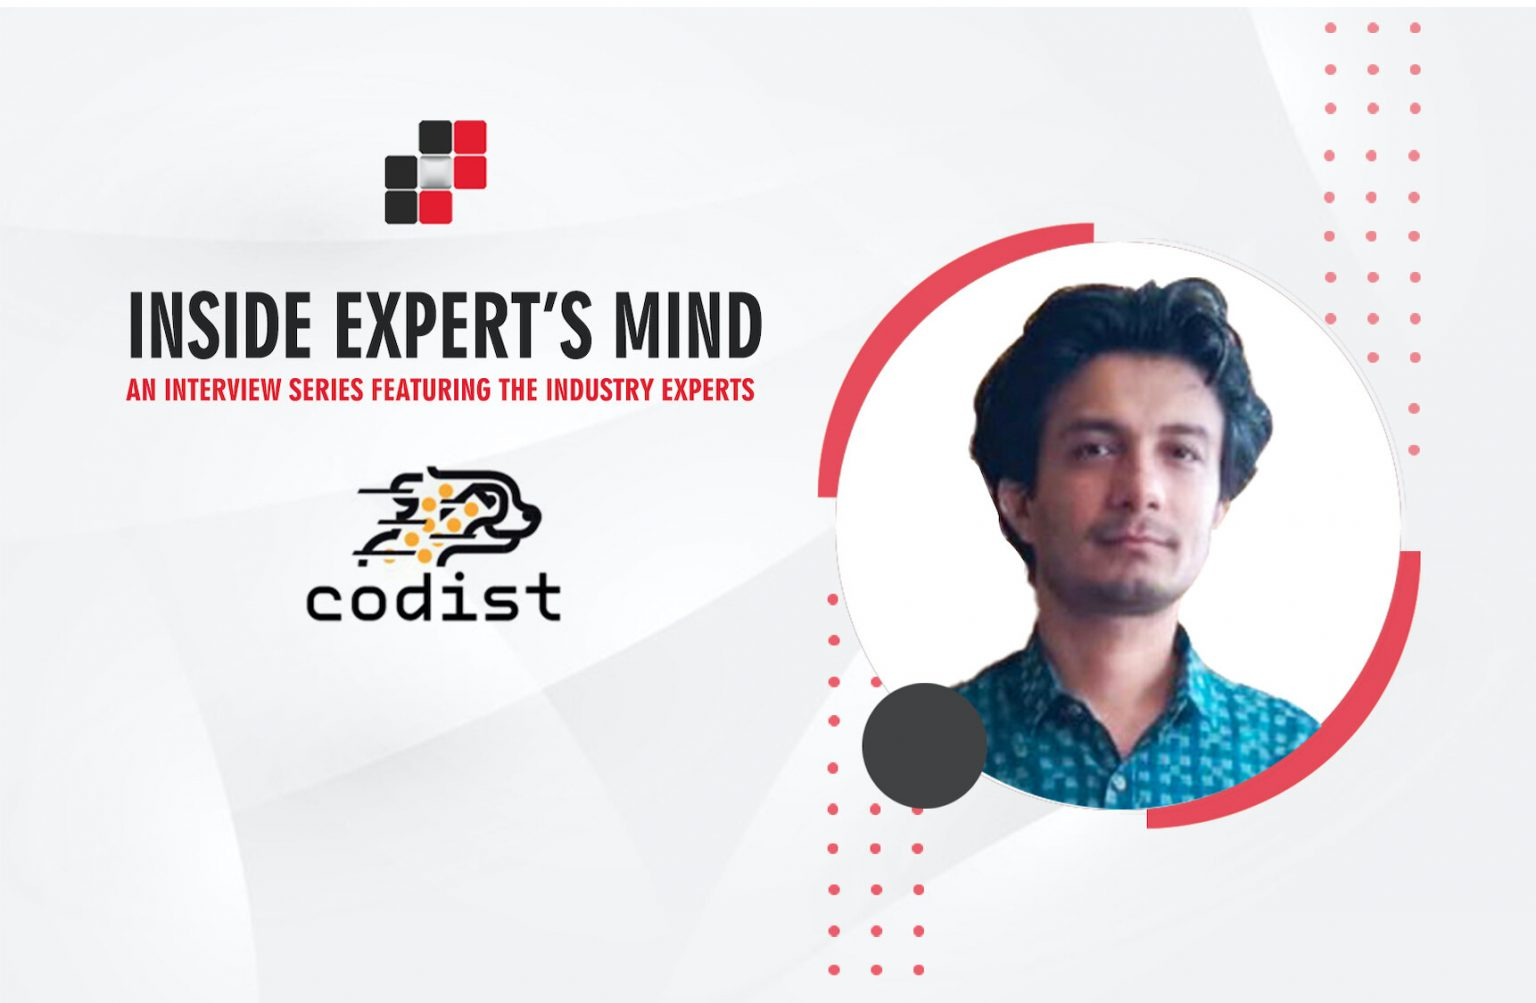 Shubhadeep Roychowdhury, CTO at CodistAI